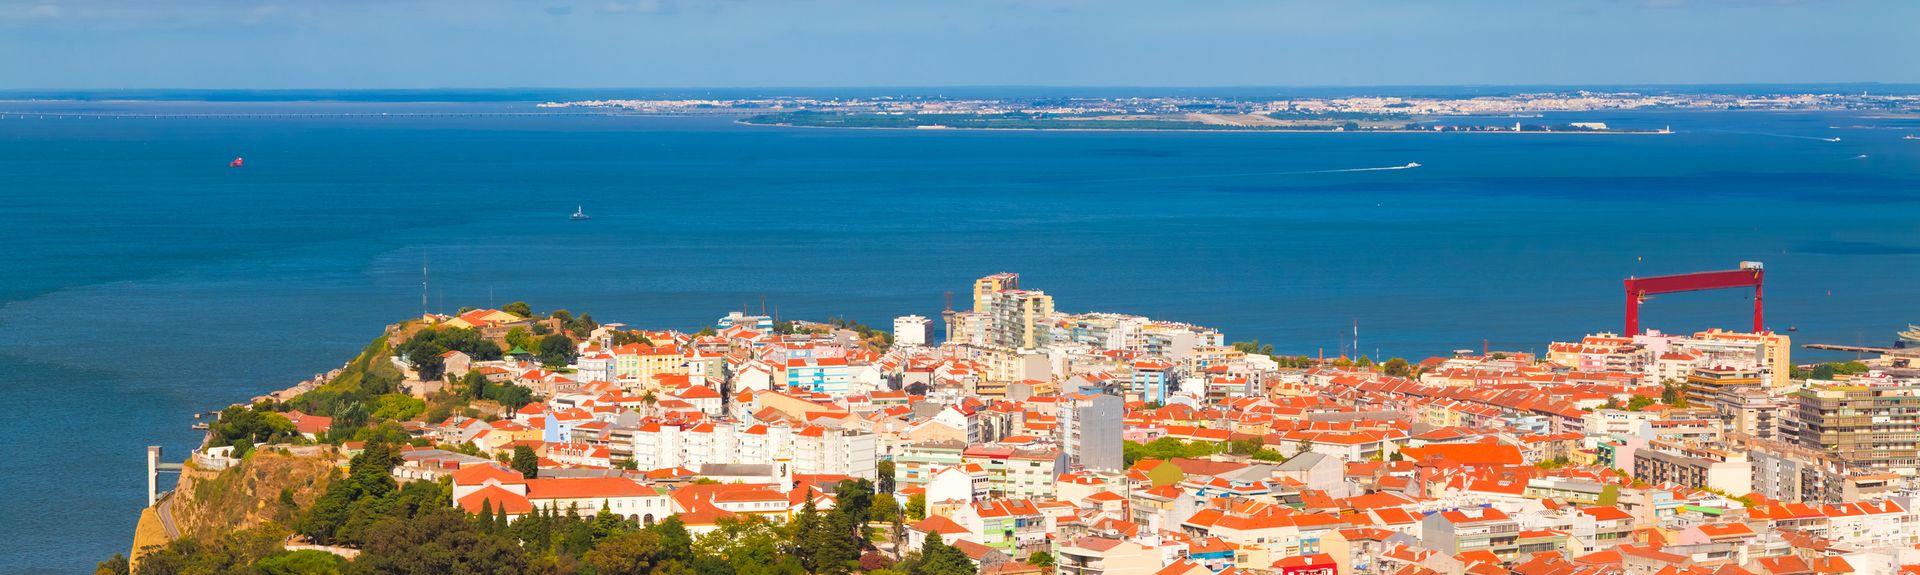 Obidos, Leiria District, Portugal